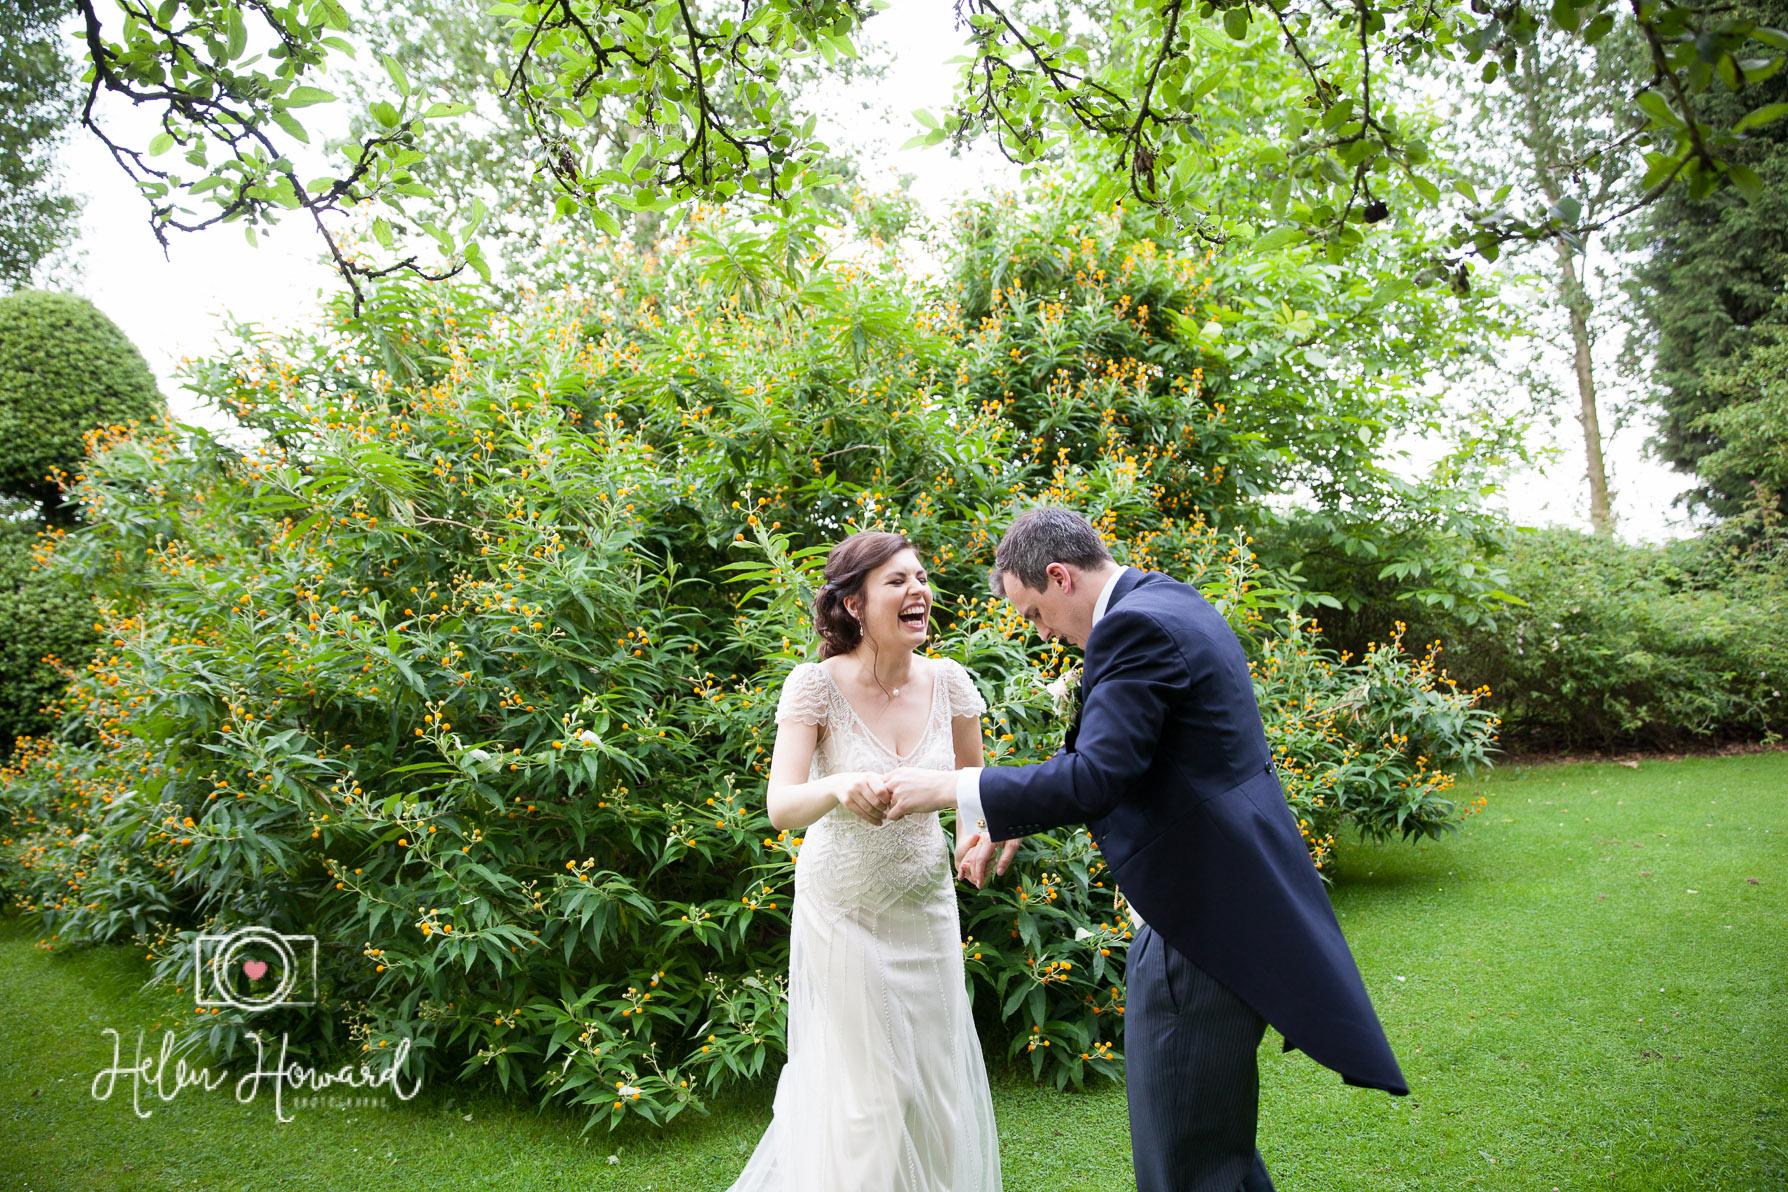 Helen Howard Photography Packington Moor Wedding-113.jpg